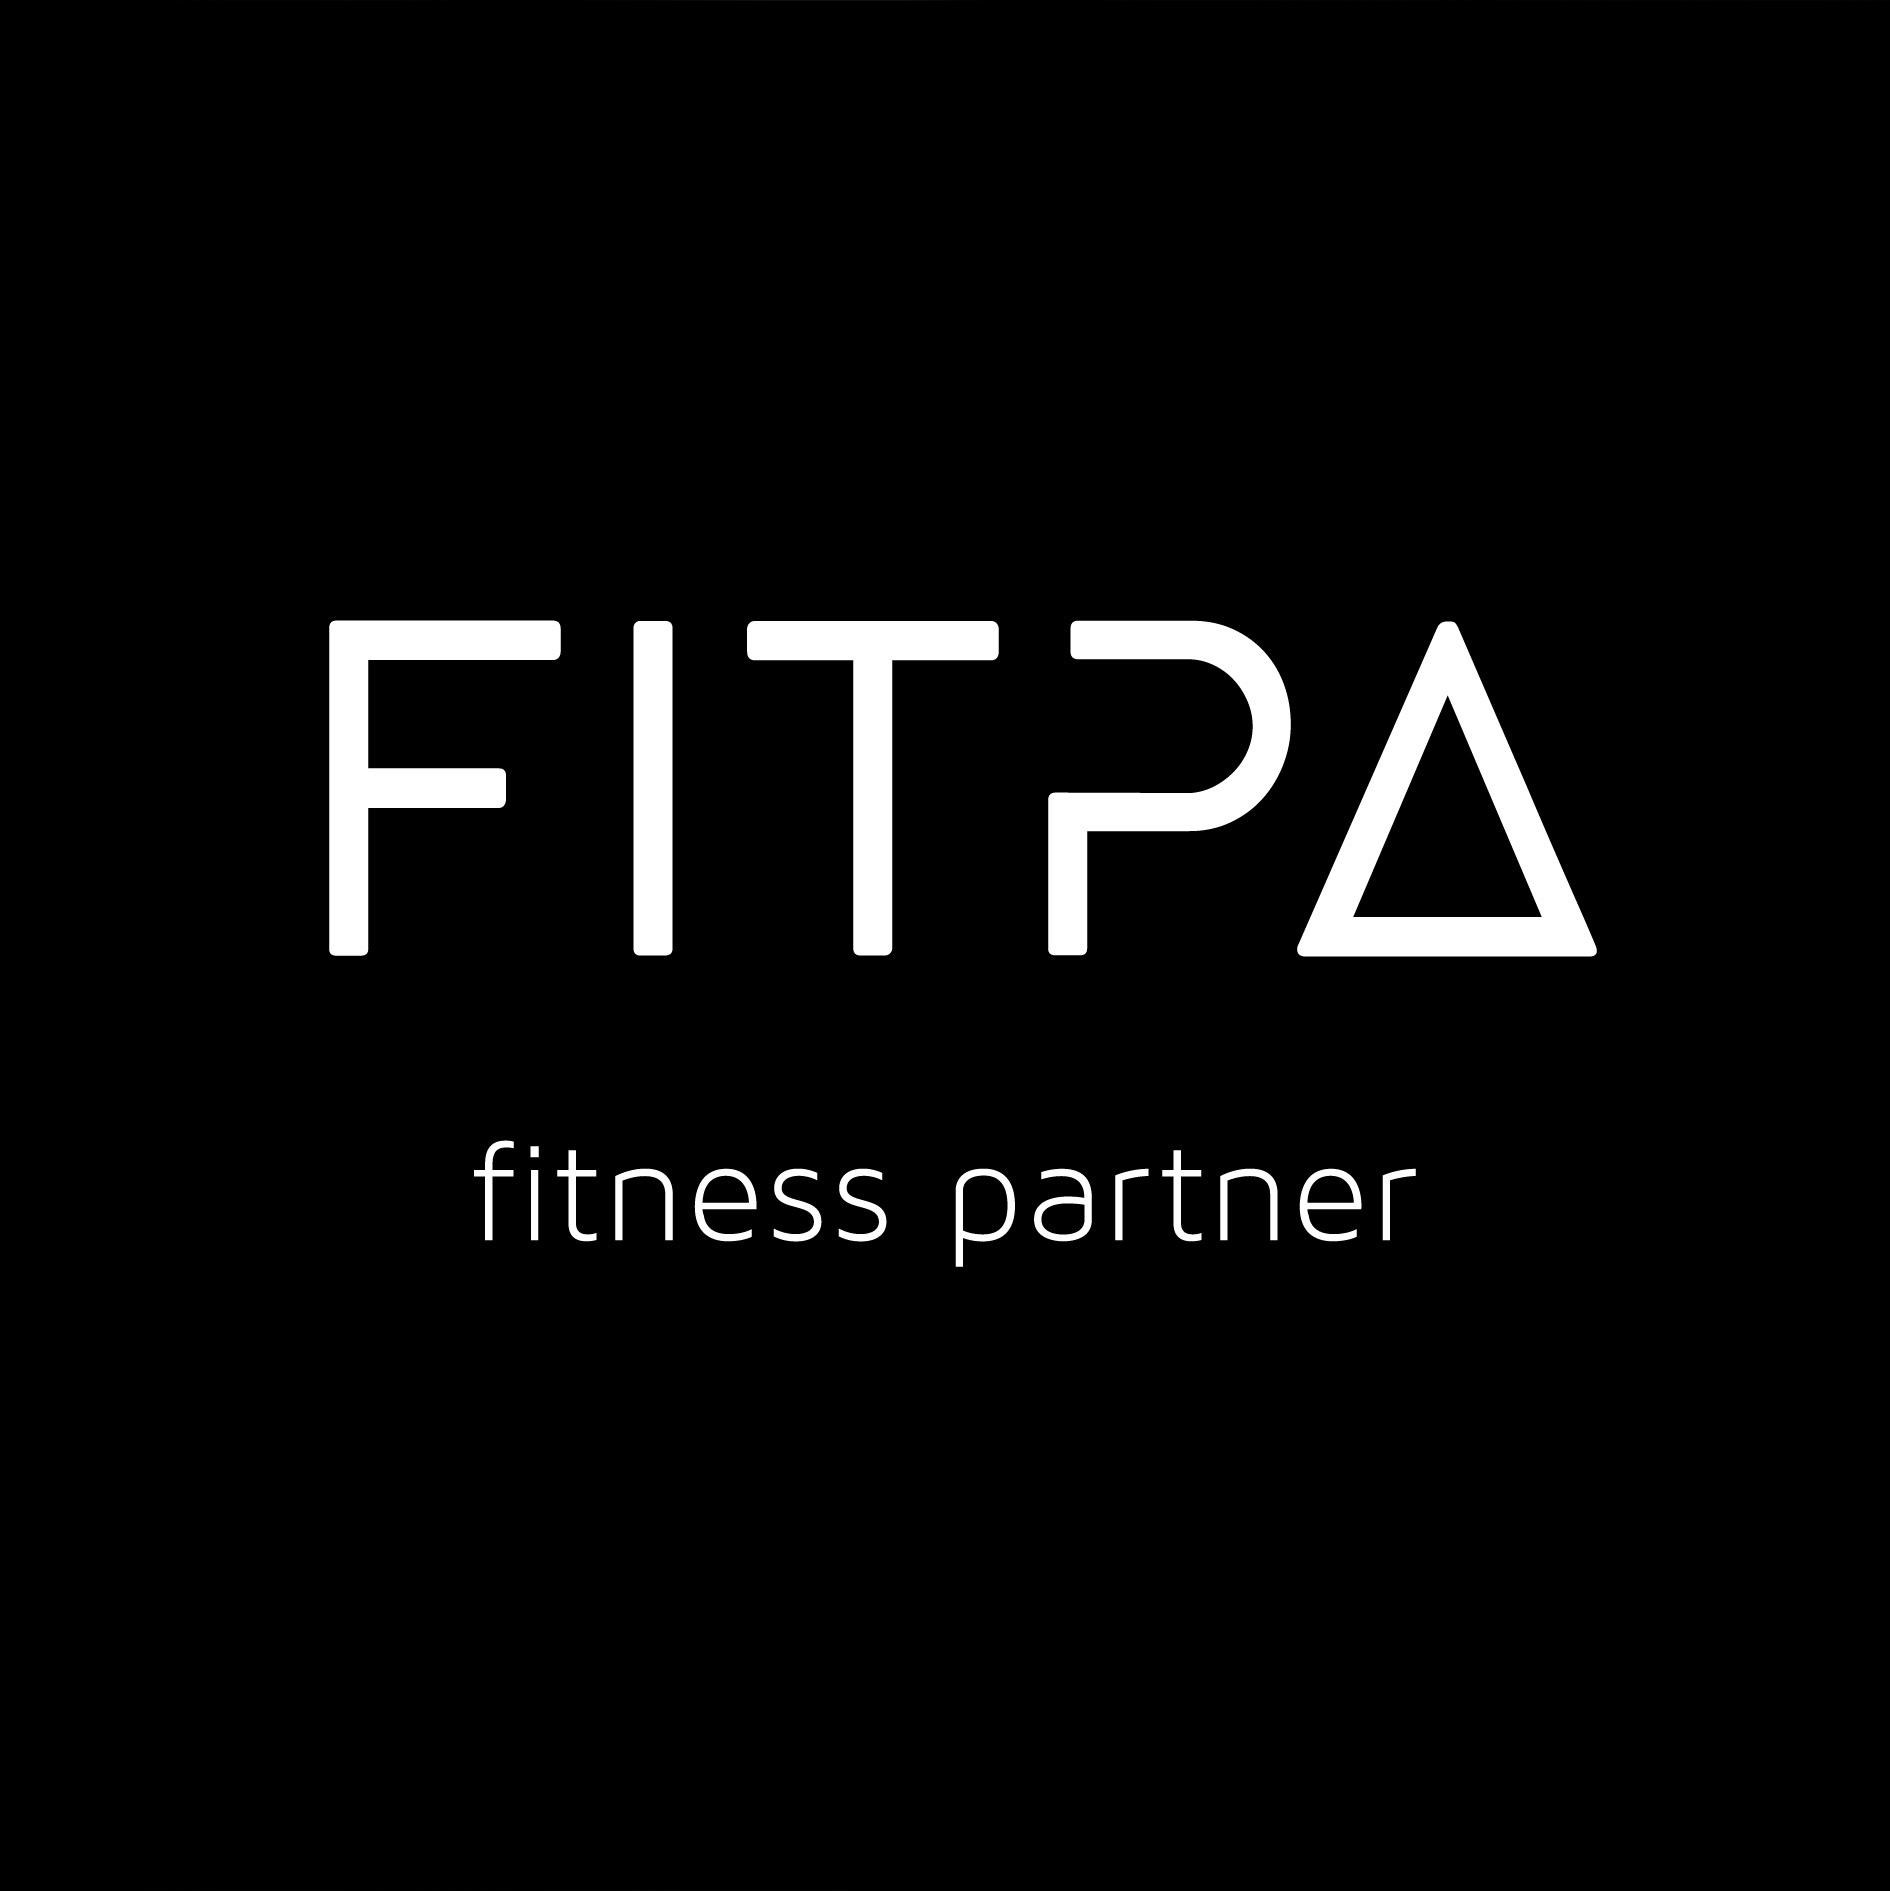 FITPA fitness partner